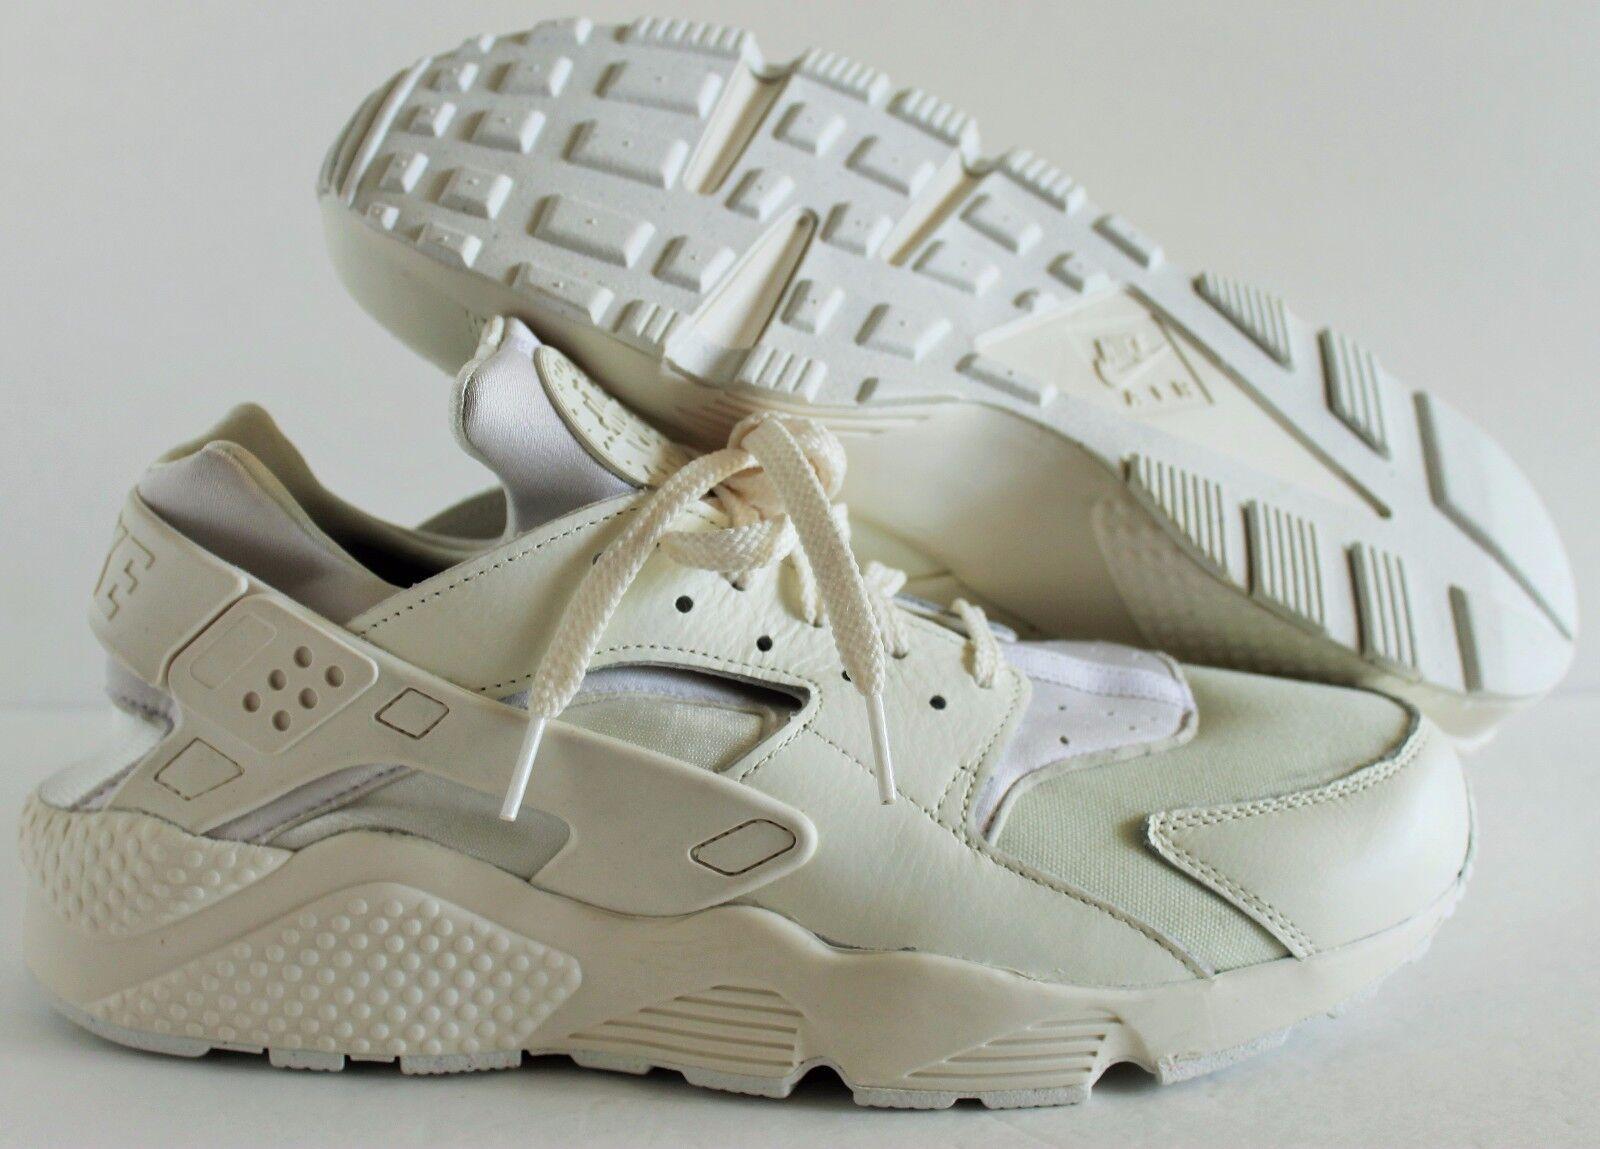 Nike Men's Huarache Premium ID Off-White SZ 12 Shoes  [836138-993]